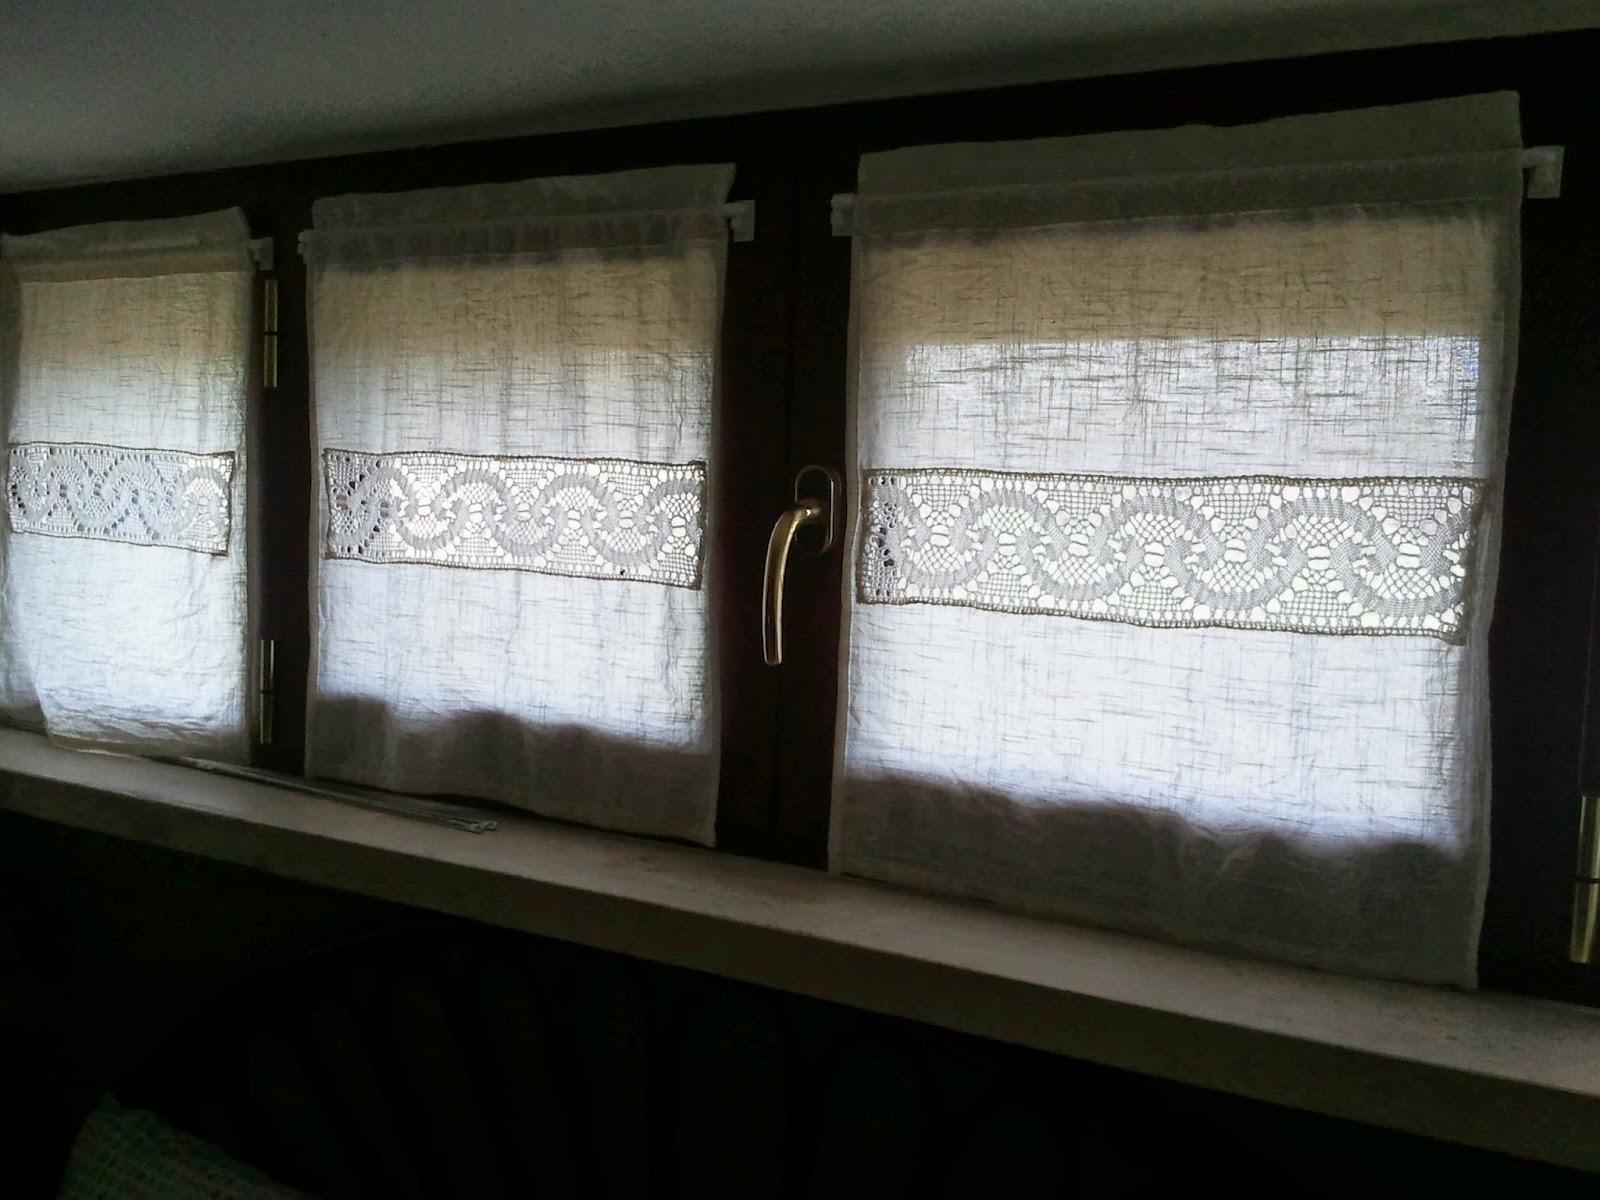 Tende per interni finestre piccole tende da interni - Tende coprenti per finestre ...